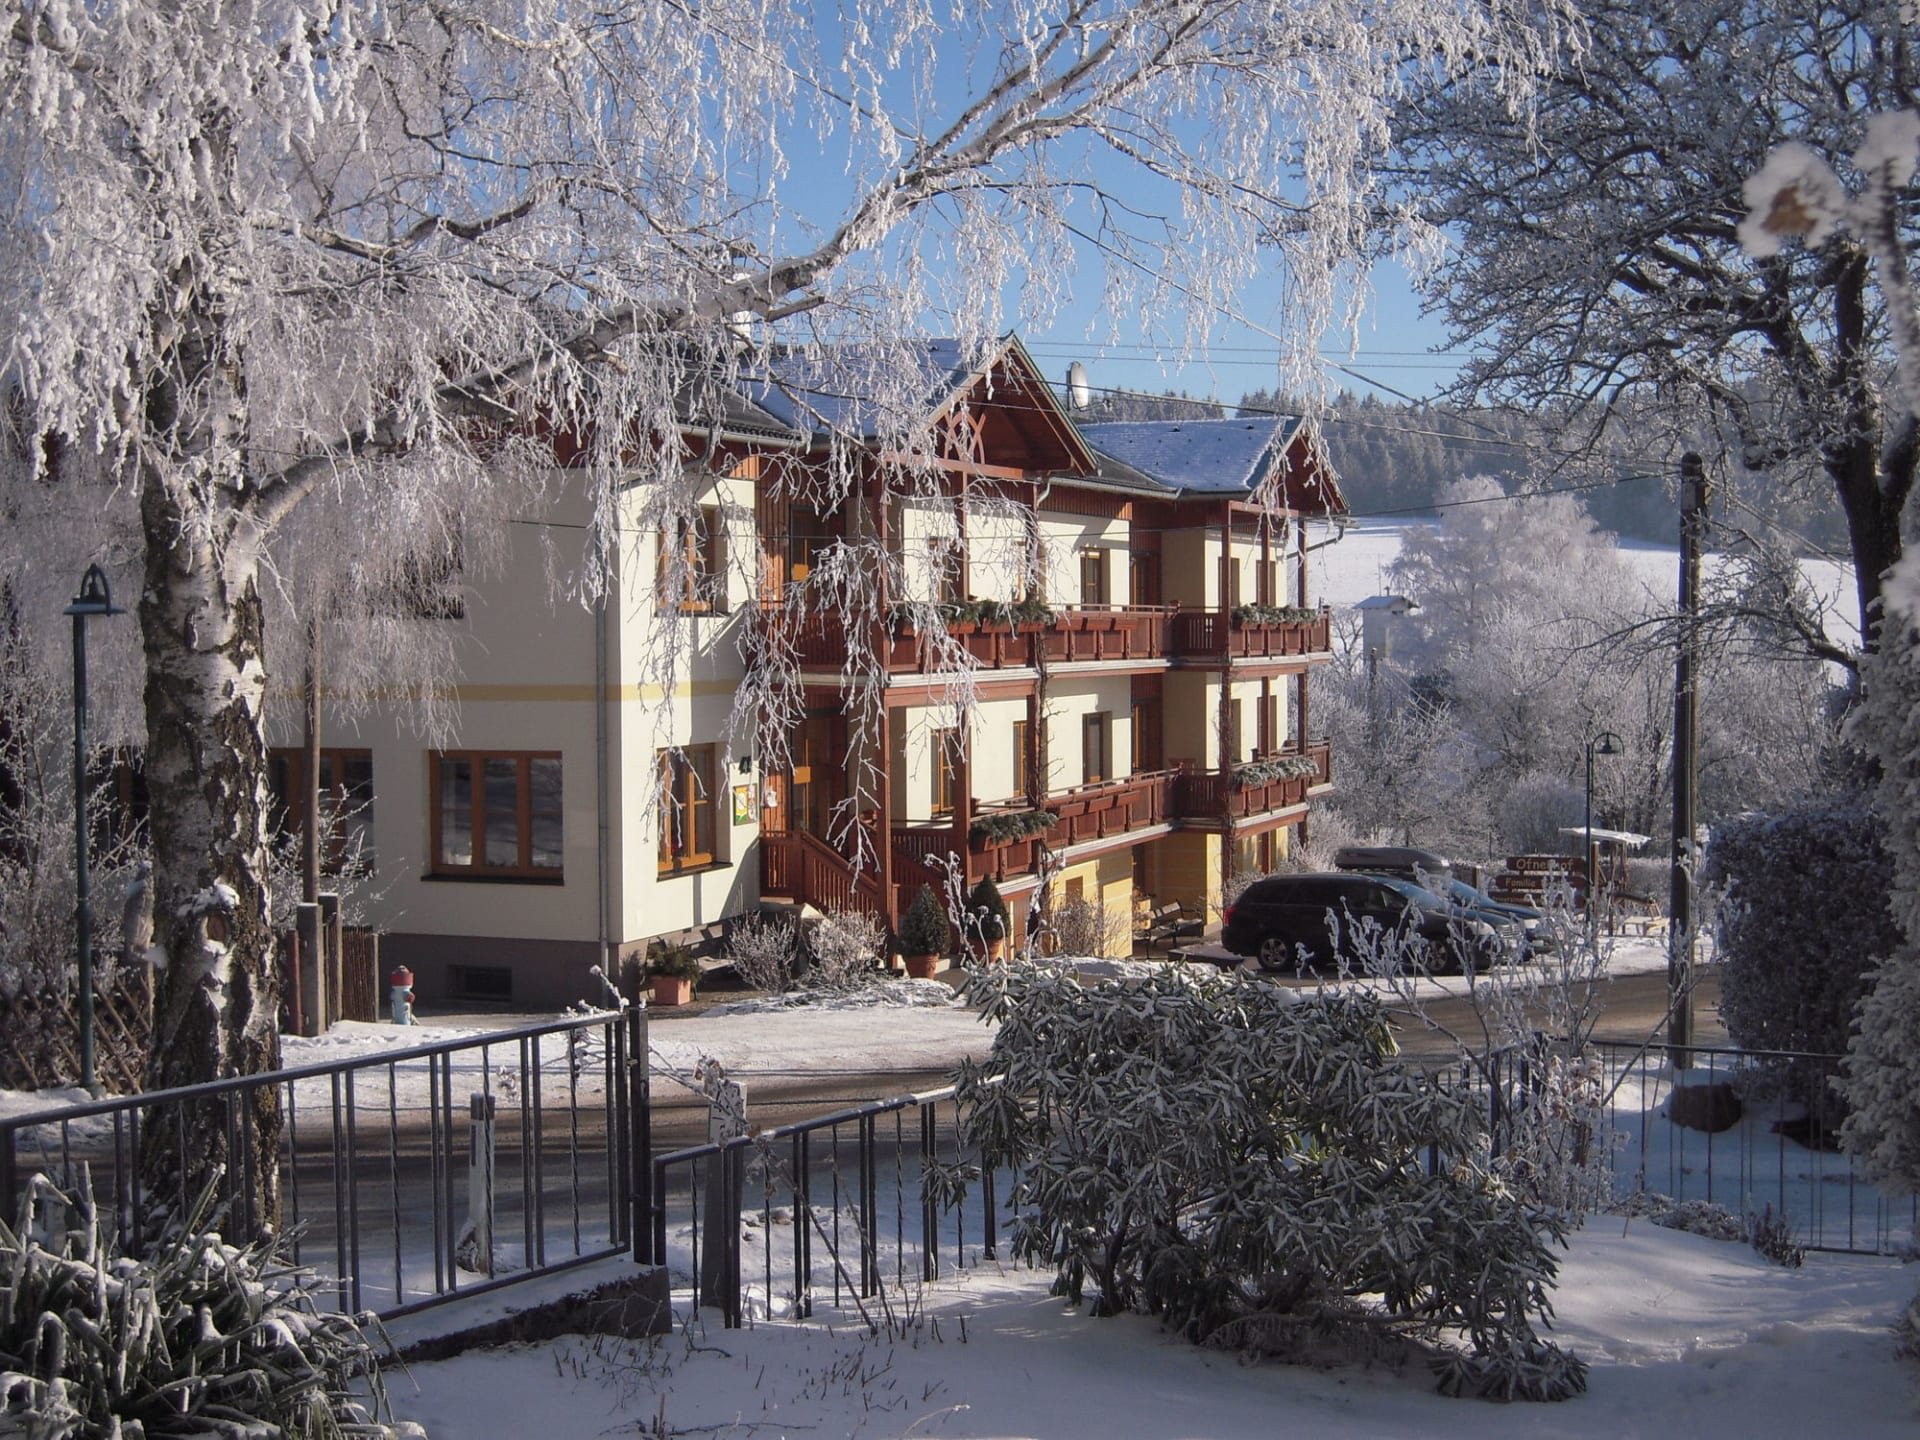 Winterromantik am Ofnerhof